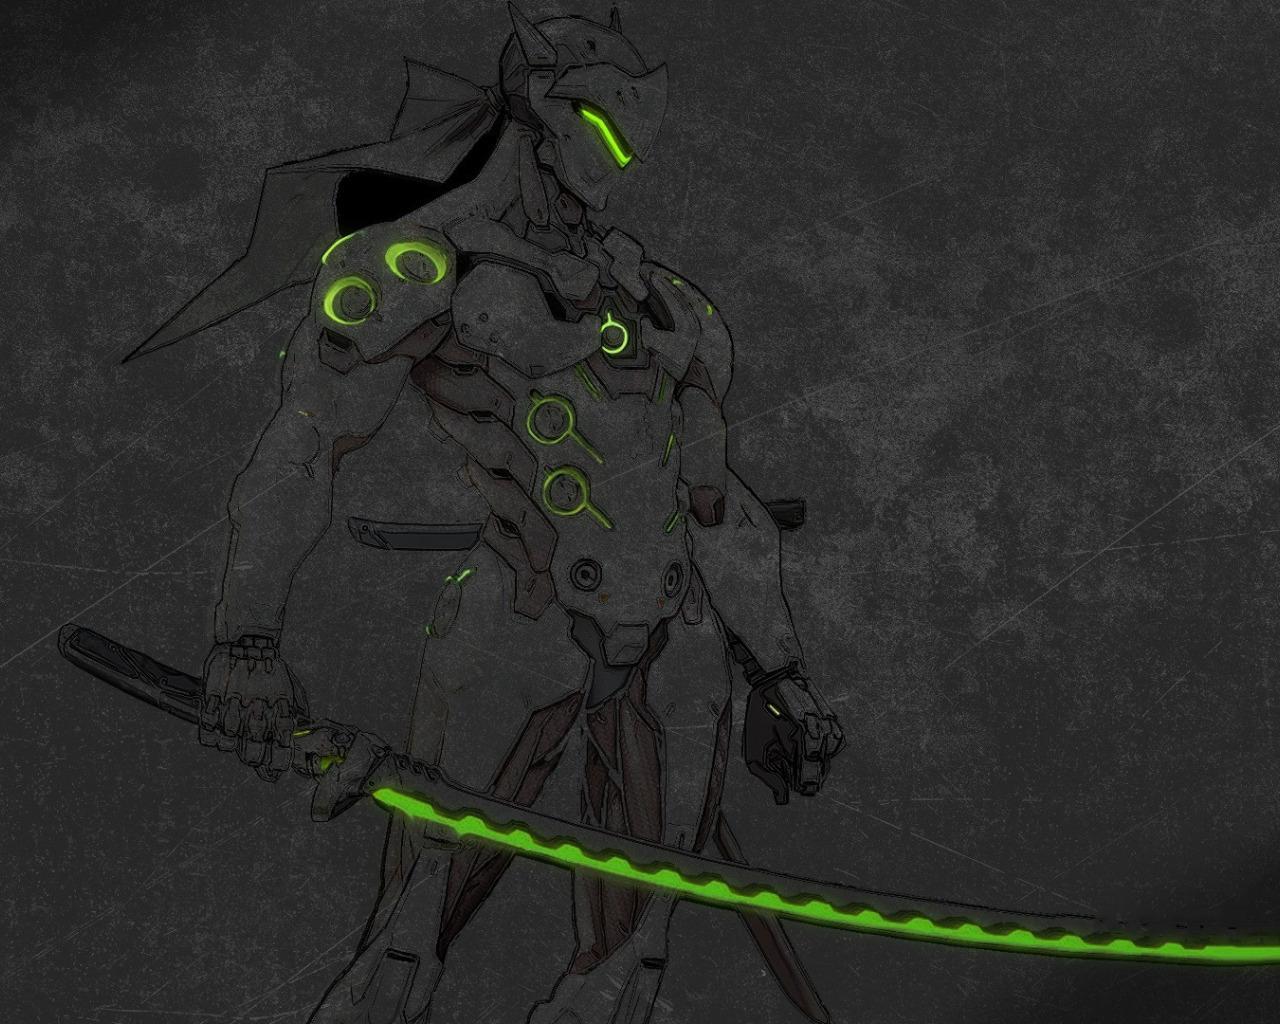 Download Wallpaper Sword Armor Bodysuit Ken Blade Dragon Ninja Suit God Mercenary Overwatch Genji Shimada Genji Section Games In Resolution 1280x1024 See more ideas about ninja armor, armor, mandalorian armor. download wallpaper sword armor